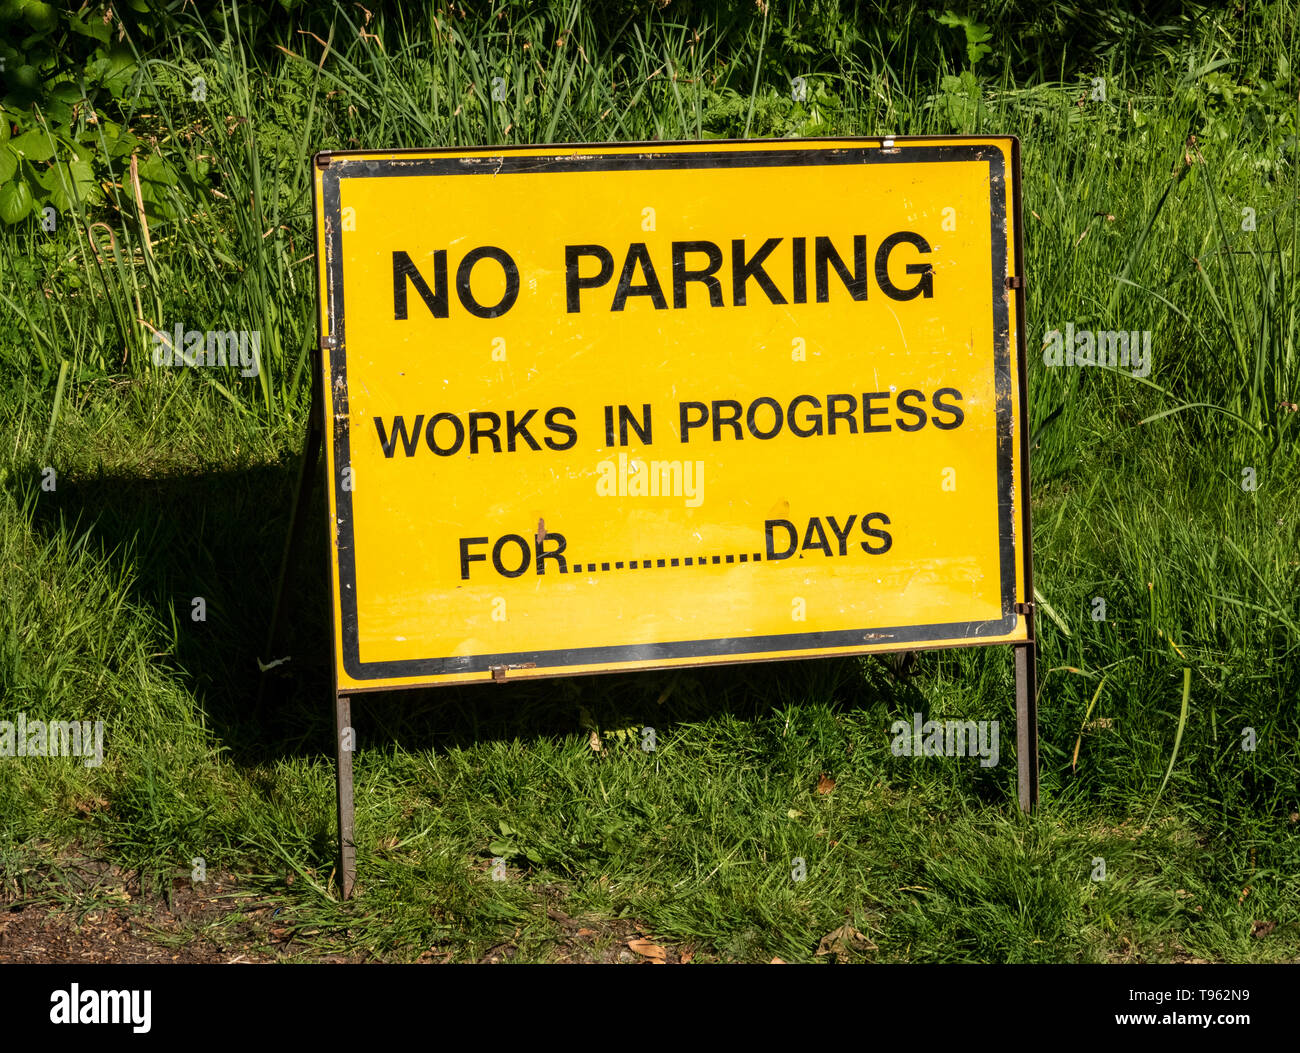 No parking, work in progress sign - Stock Image